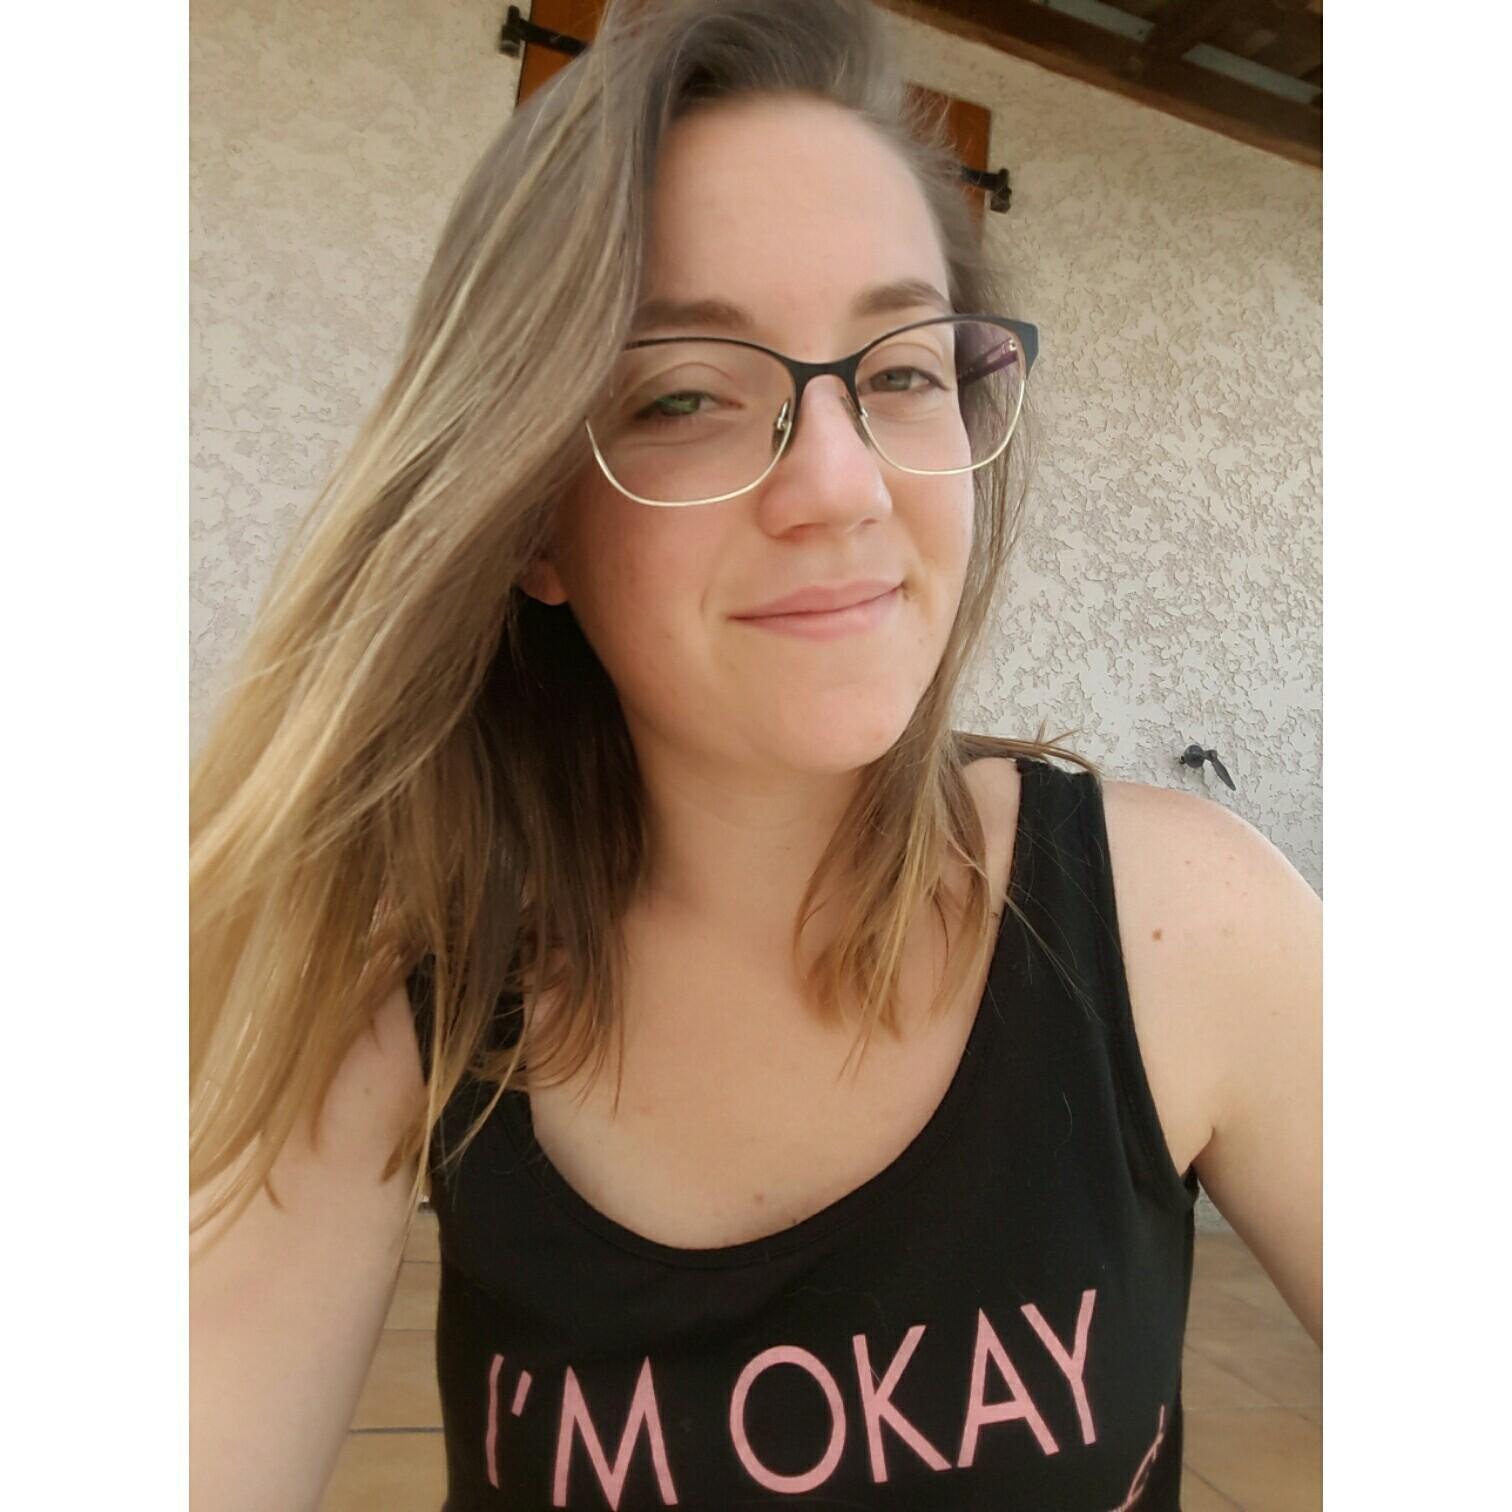 Célia